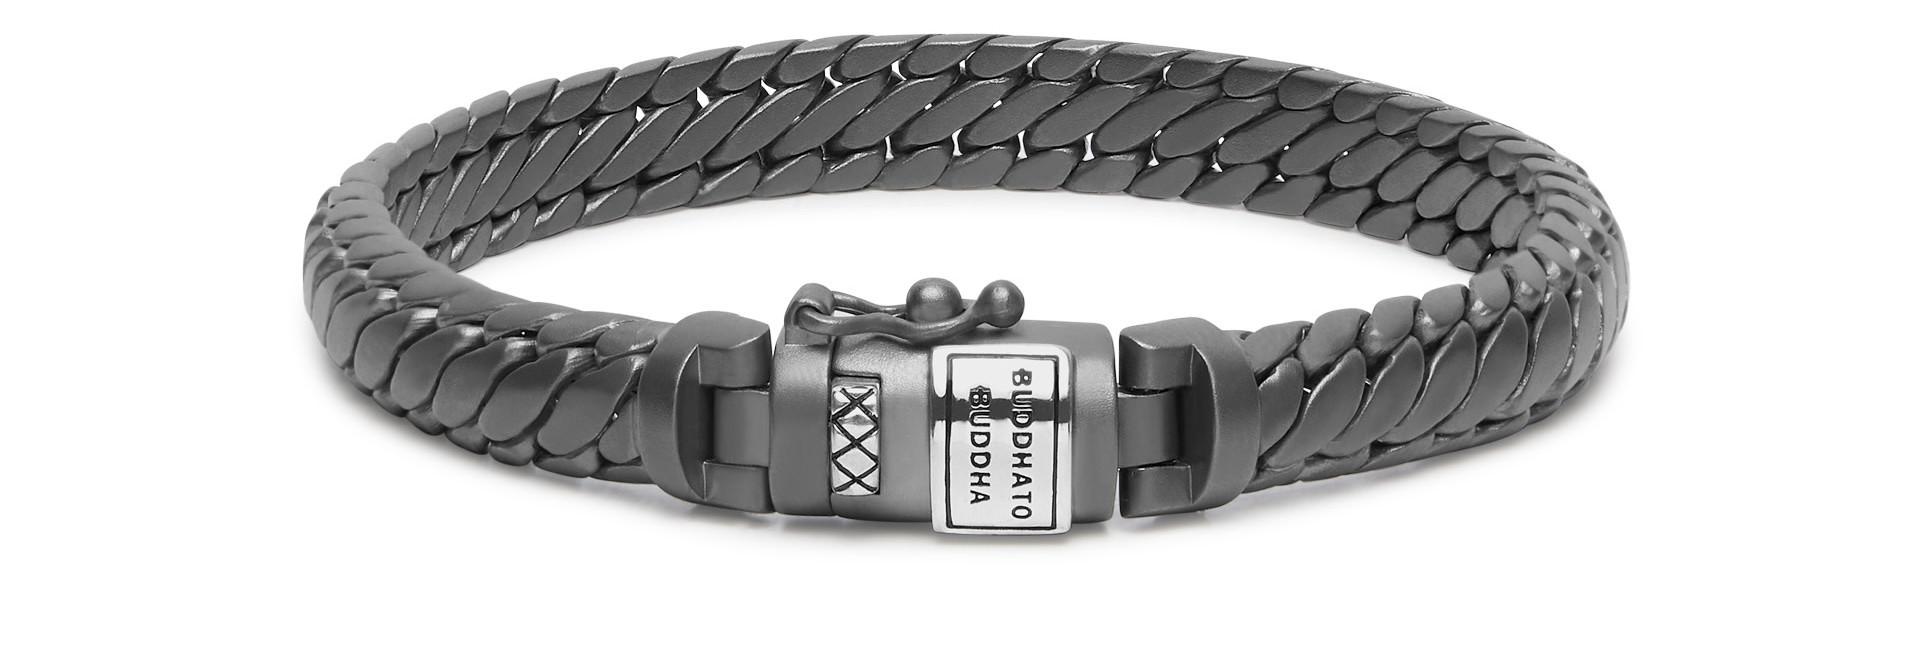 Bracelet Ben XS Black Rhodium Silver